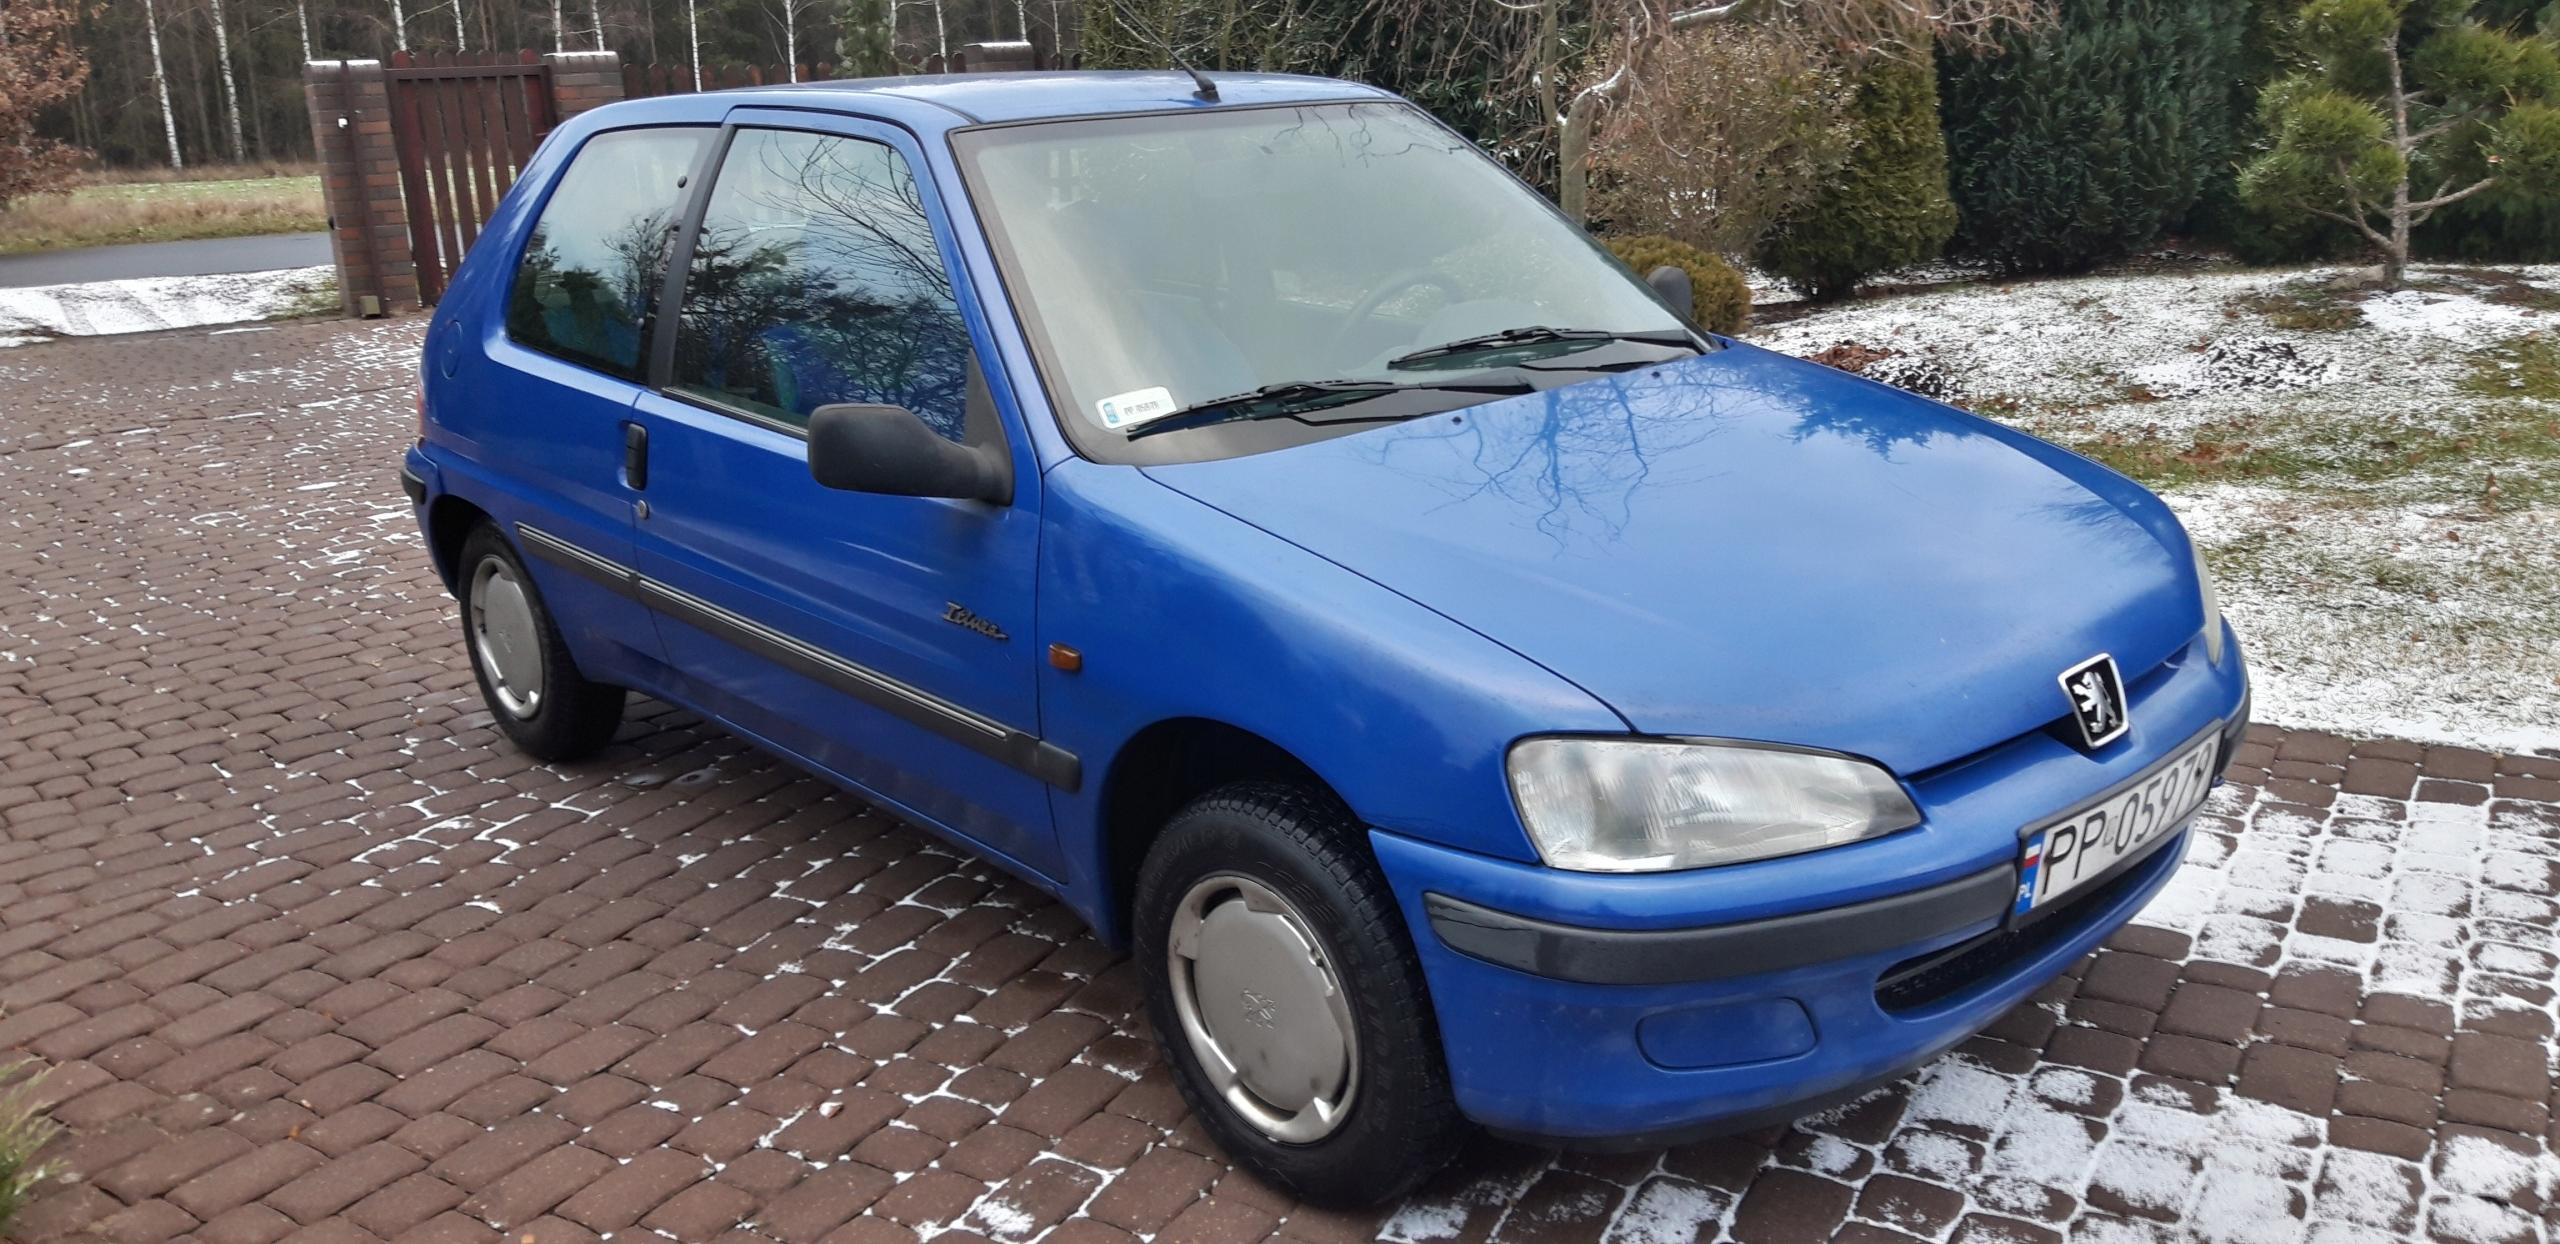 Peugeot 106 Salon Polska 20 lat w jednym domu